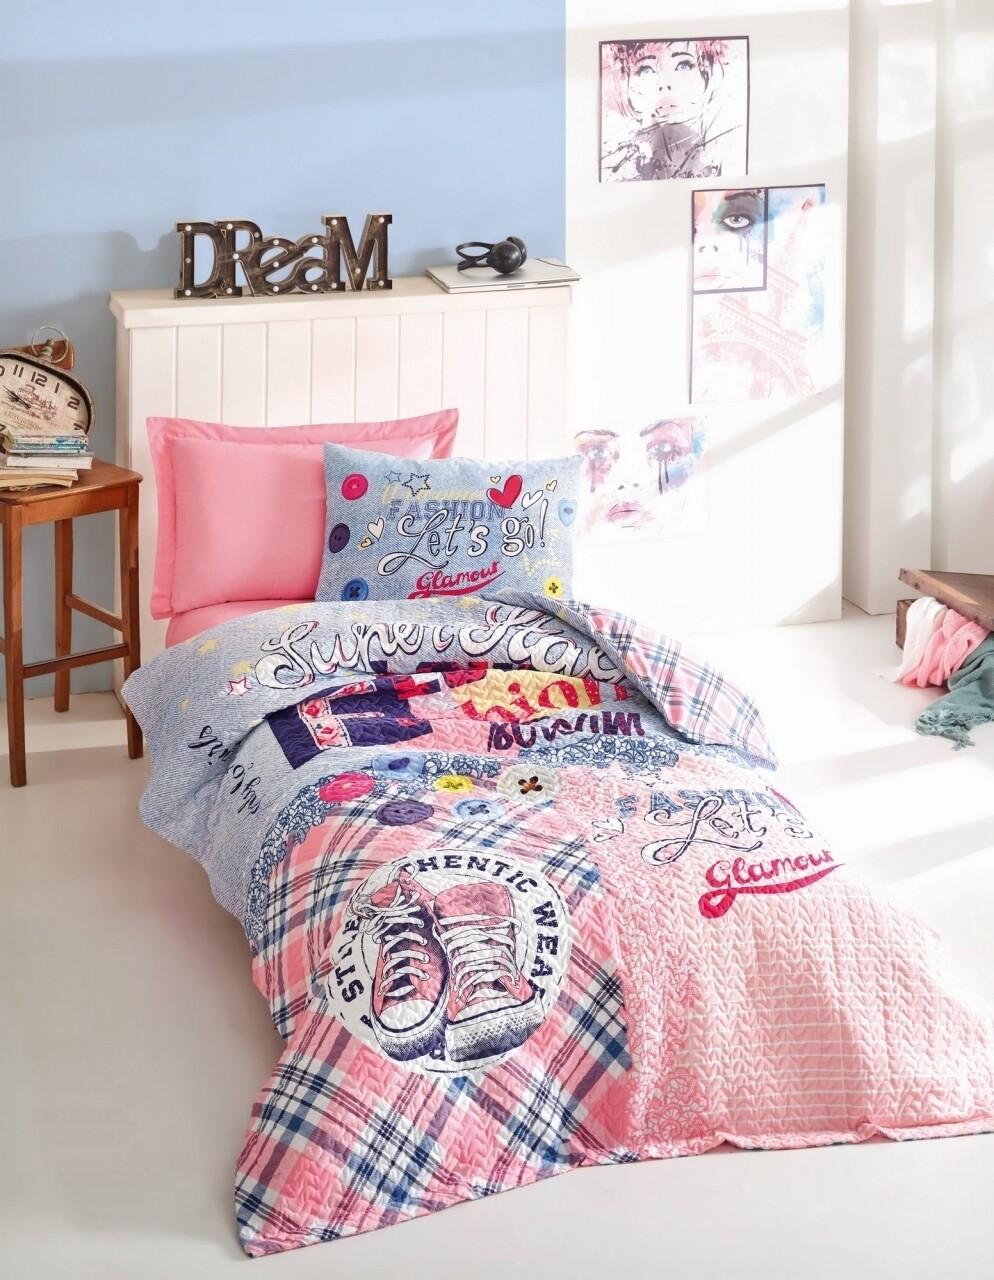 Lenjerie de pat matlasata pentru o persoana Young, 3 piese, 100% bumbac ranforce, Cotton Box, Superstar Pink